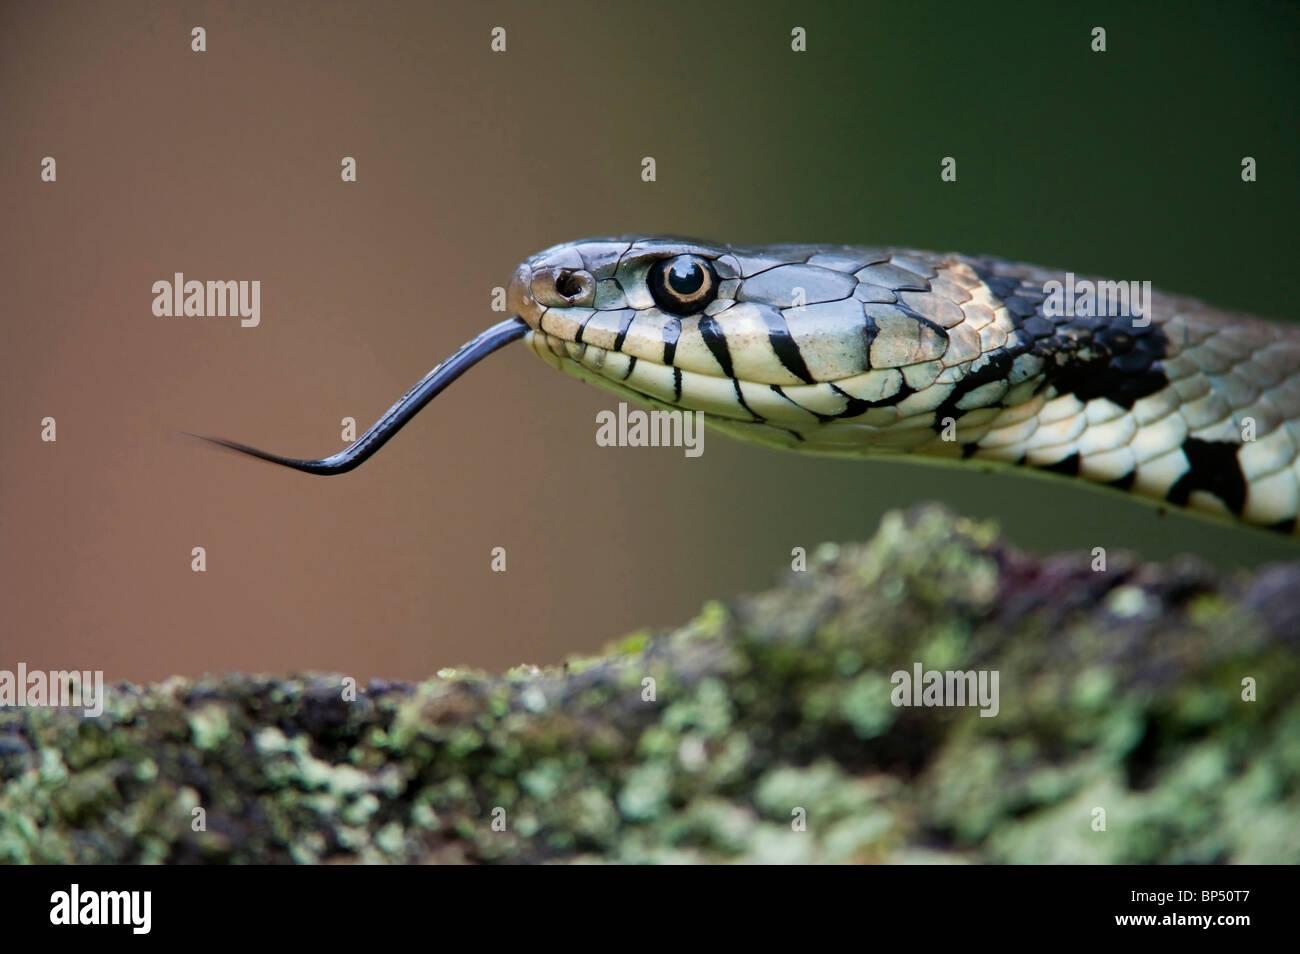 Grass Snake (Natrix natrix). Close-up of adult showing tongue, Netherlands. - Stock Image